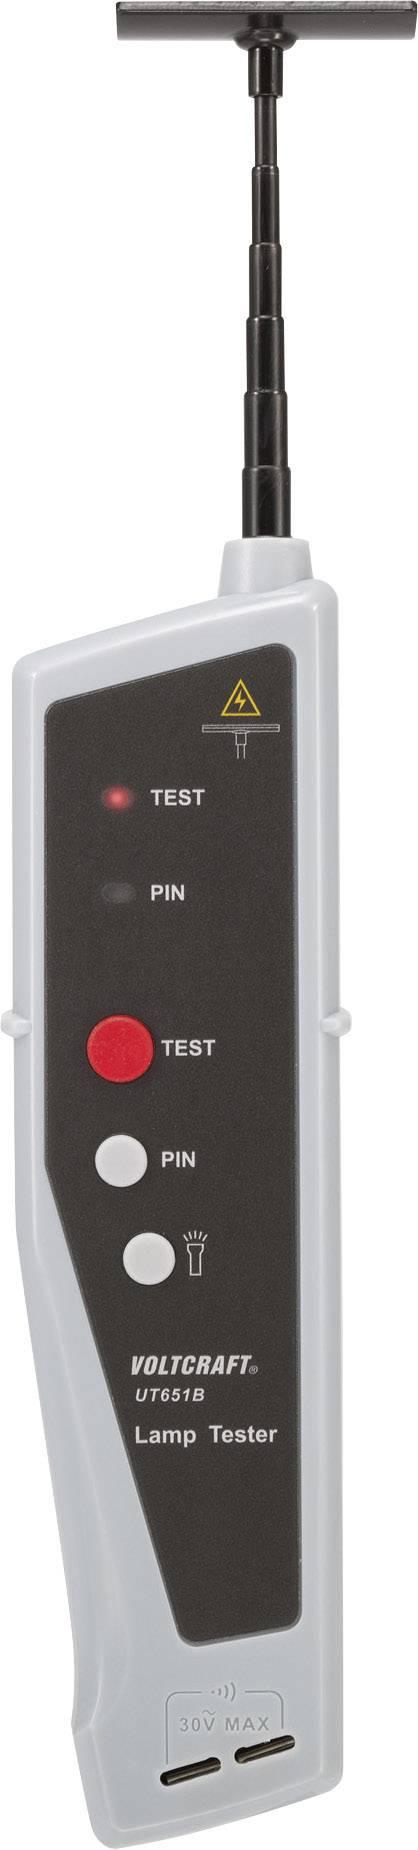 USB datalogging Esposimetro-LUX livello Data Logger